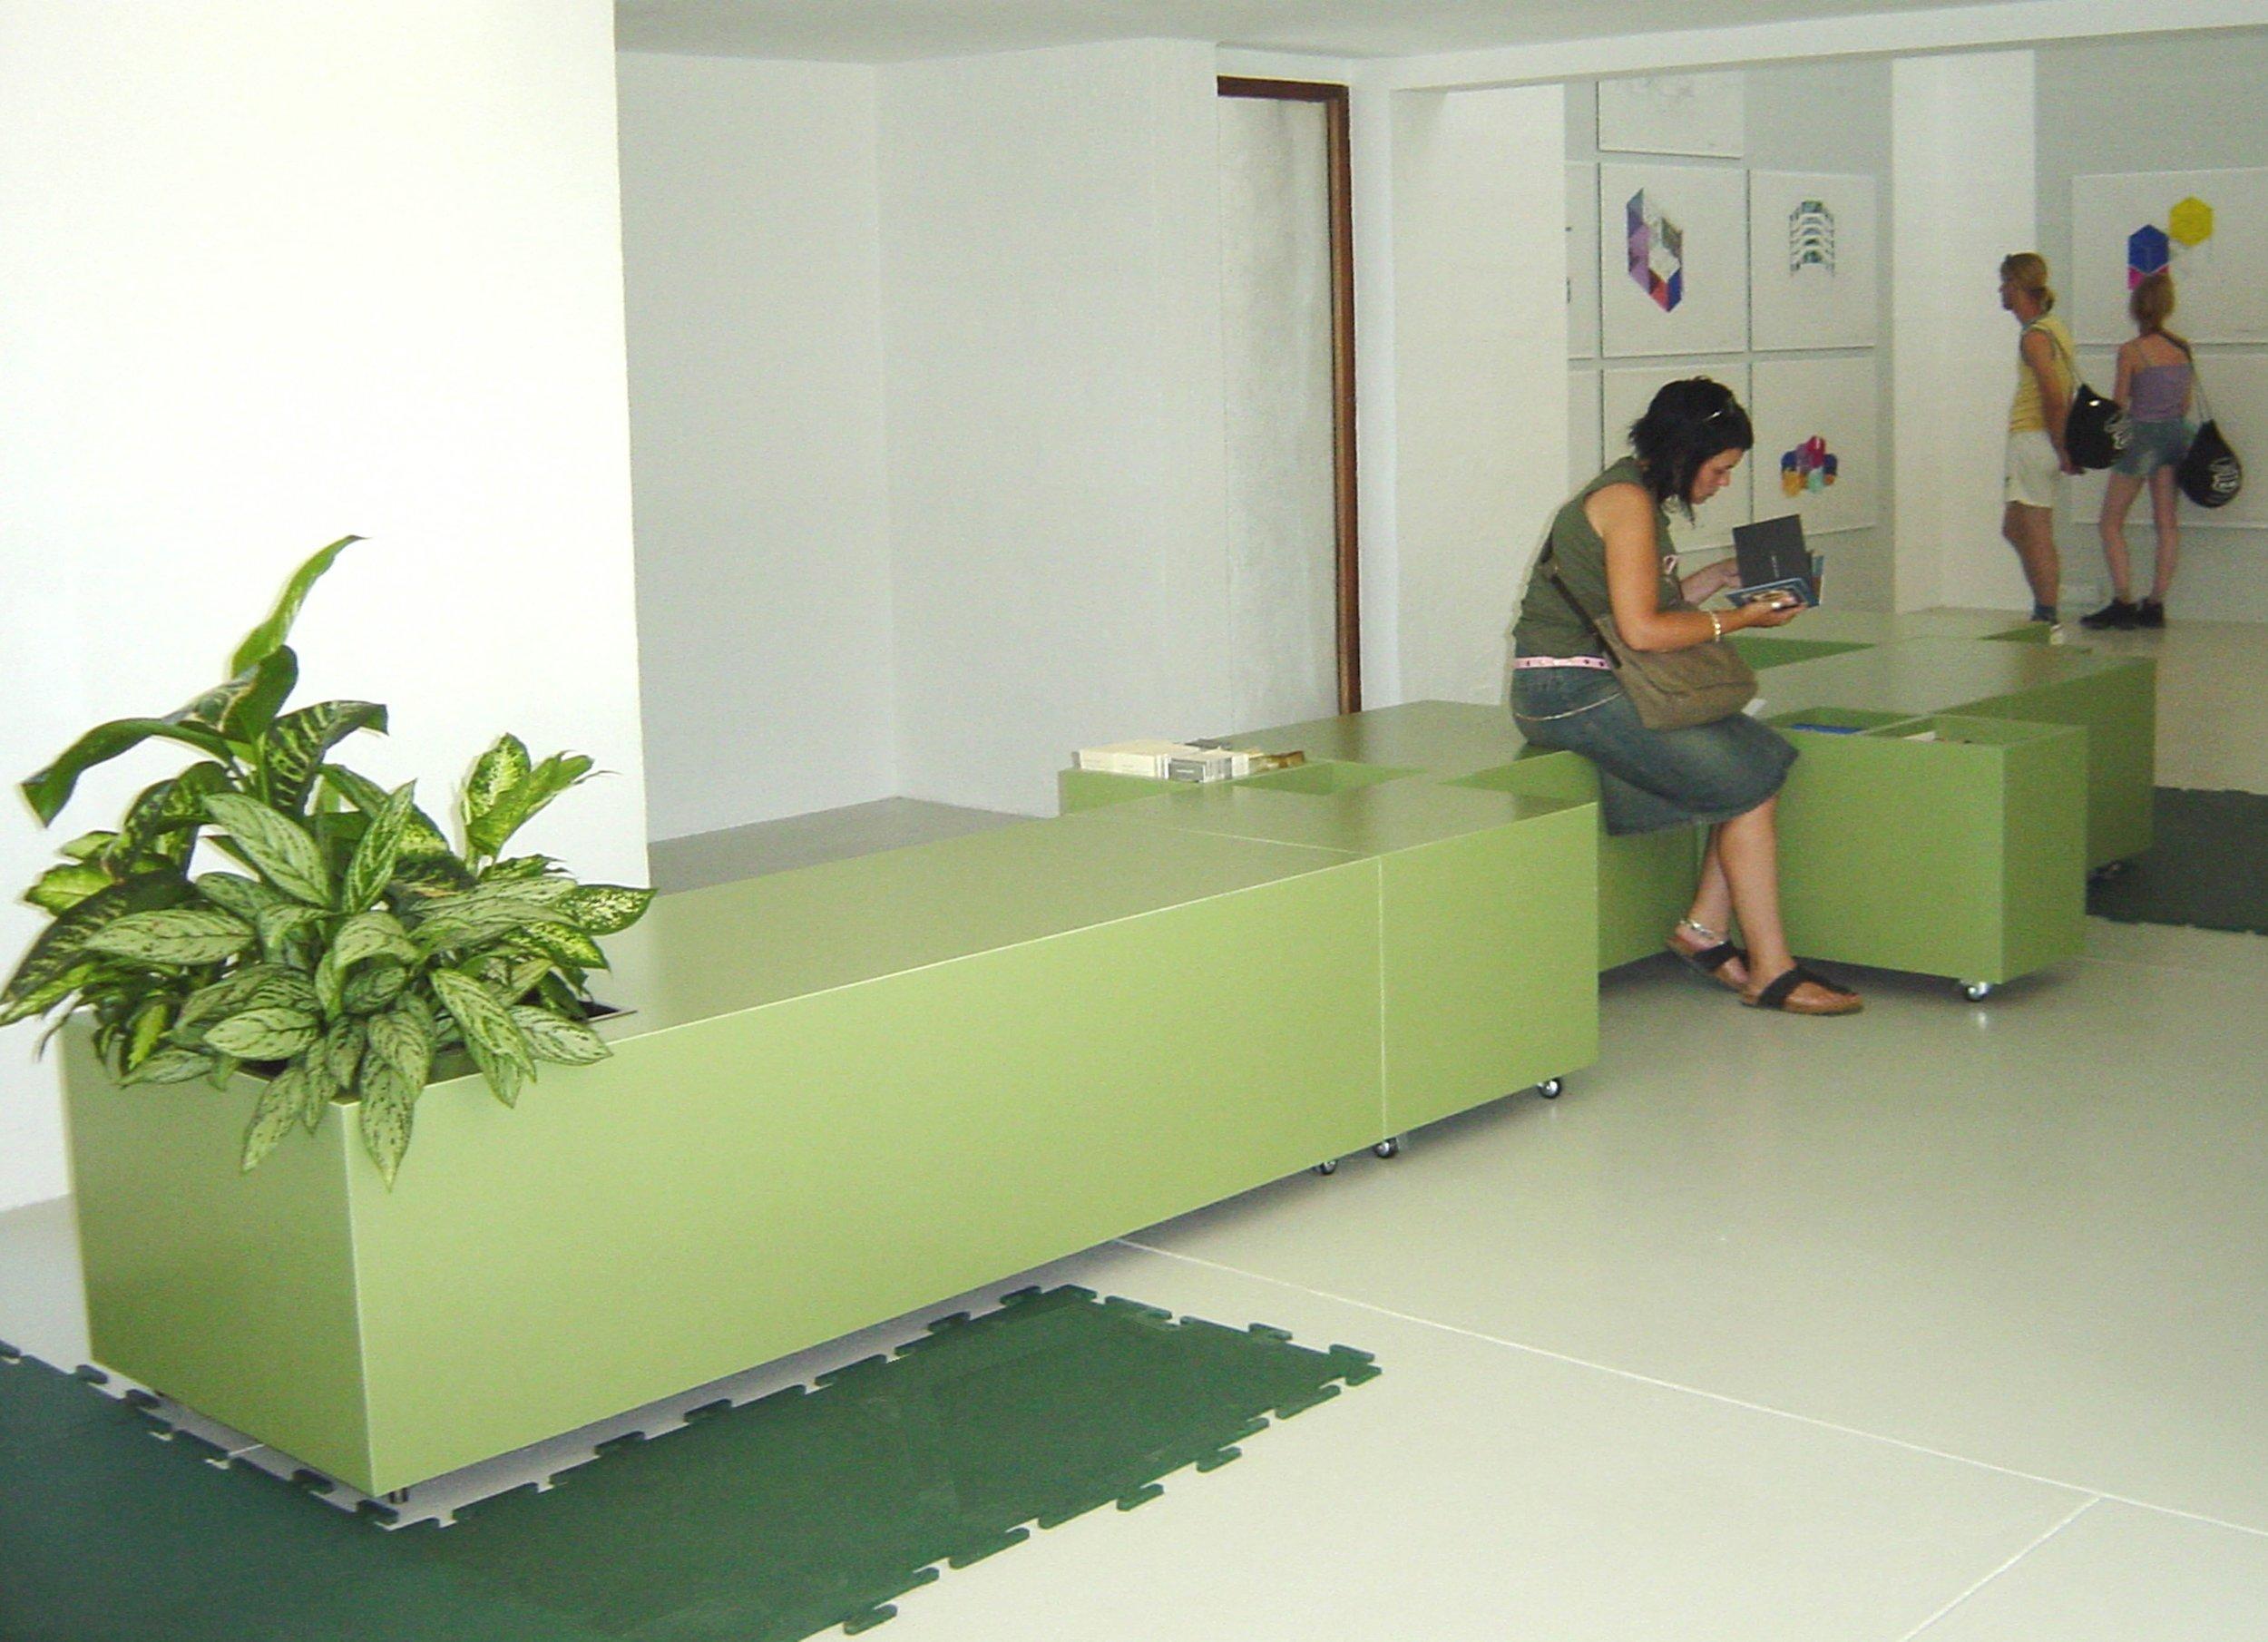 green rubber.jpg